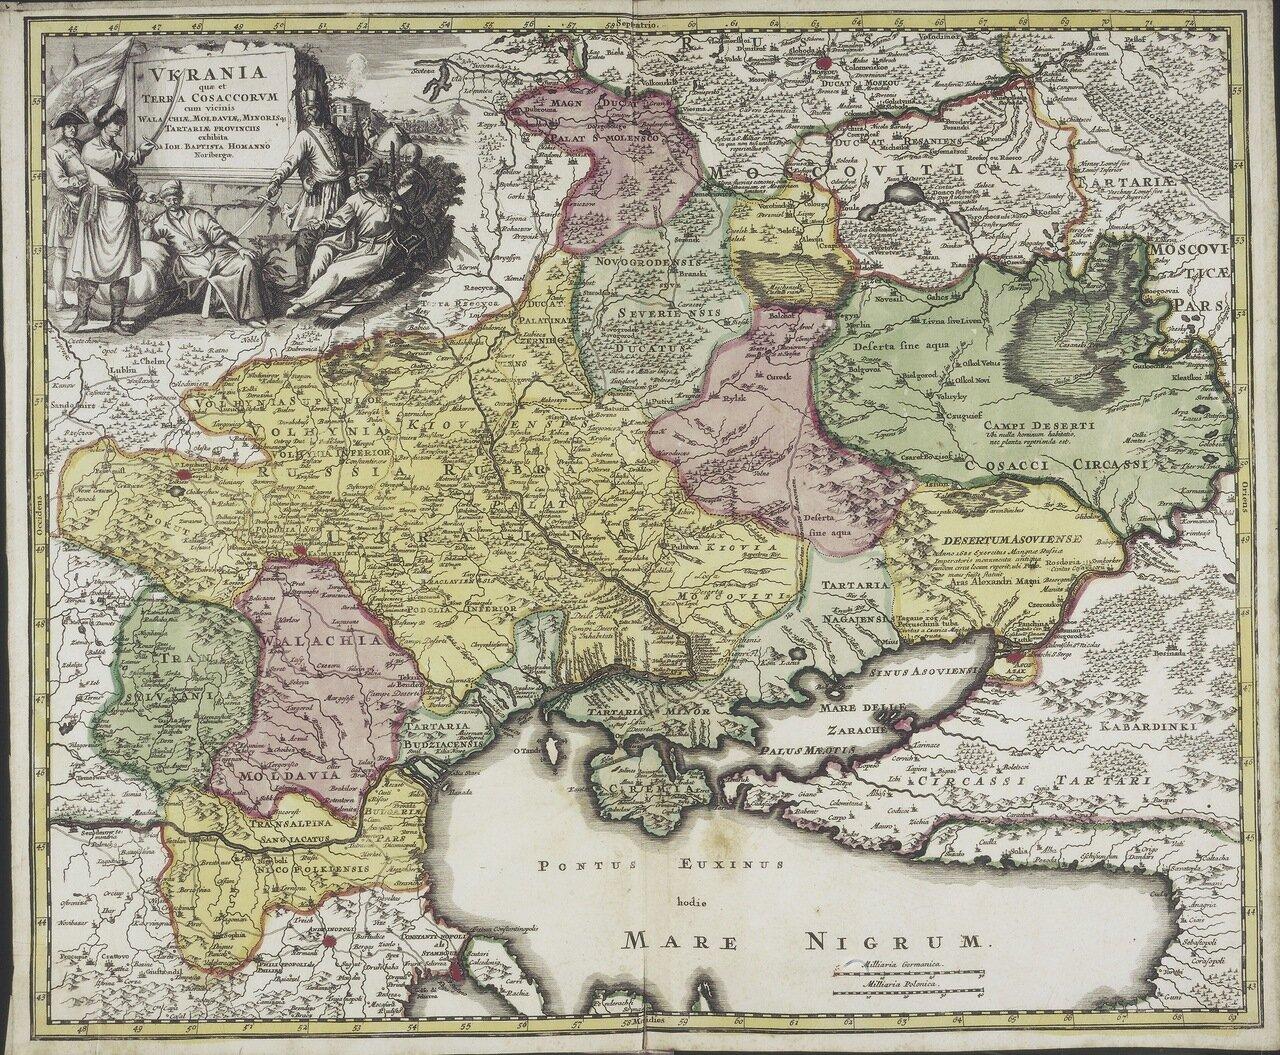 1702. Vkrania quæ et terra Cosaccorvm cum vicinis Walachiæ, Moldaviæ